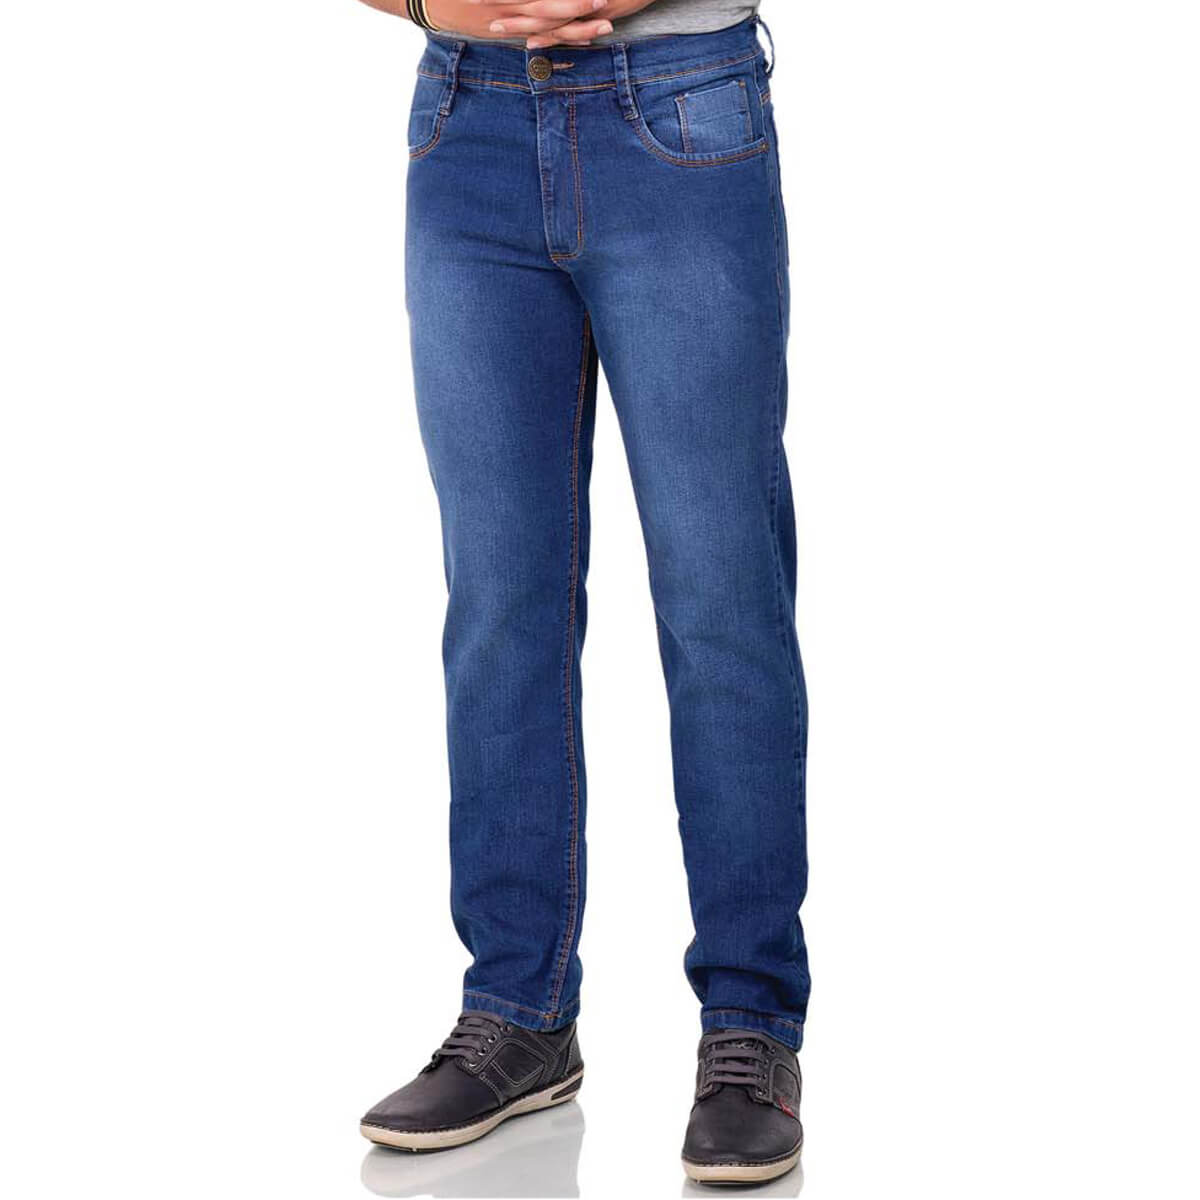 Calça Masculina Jeans Andrew